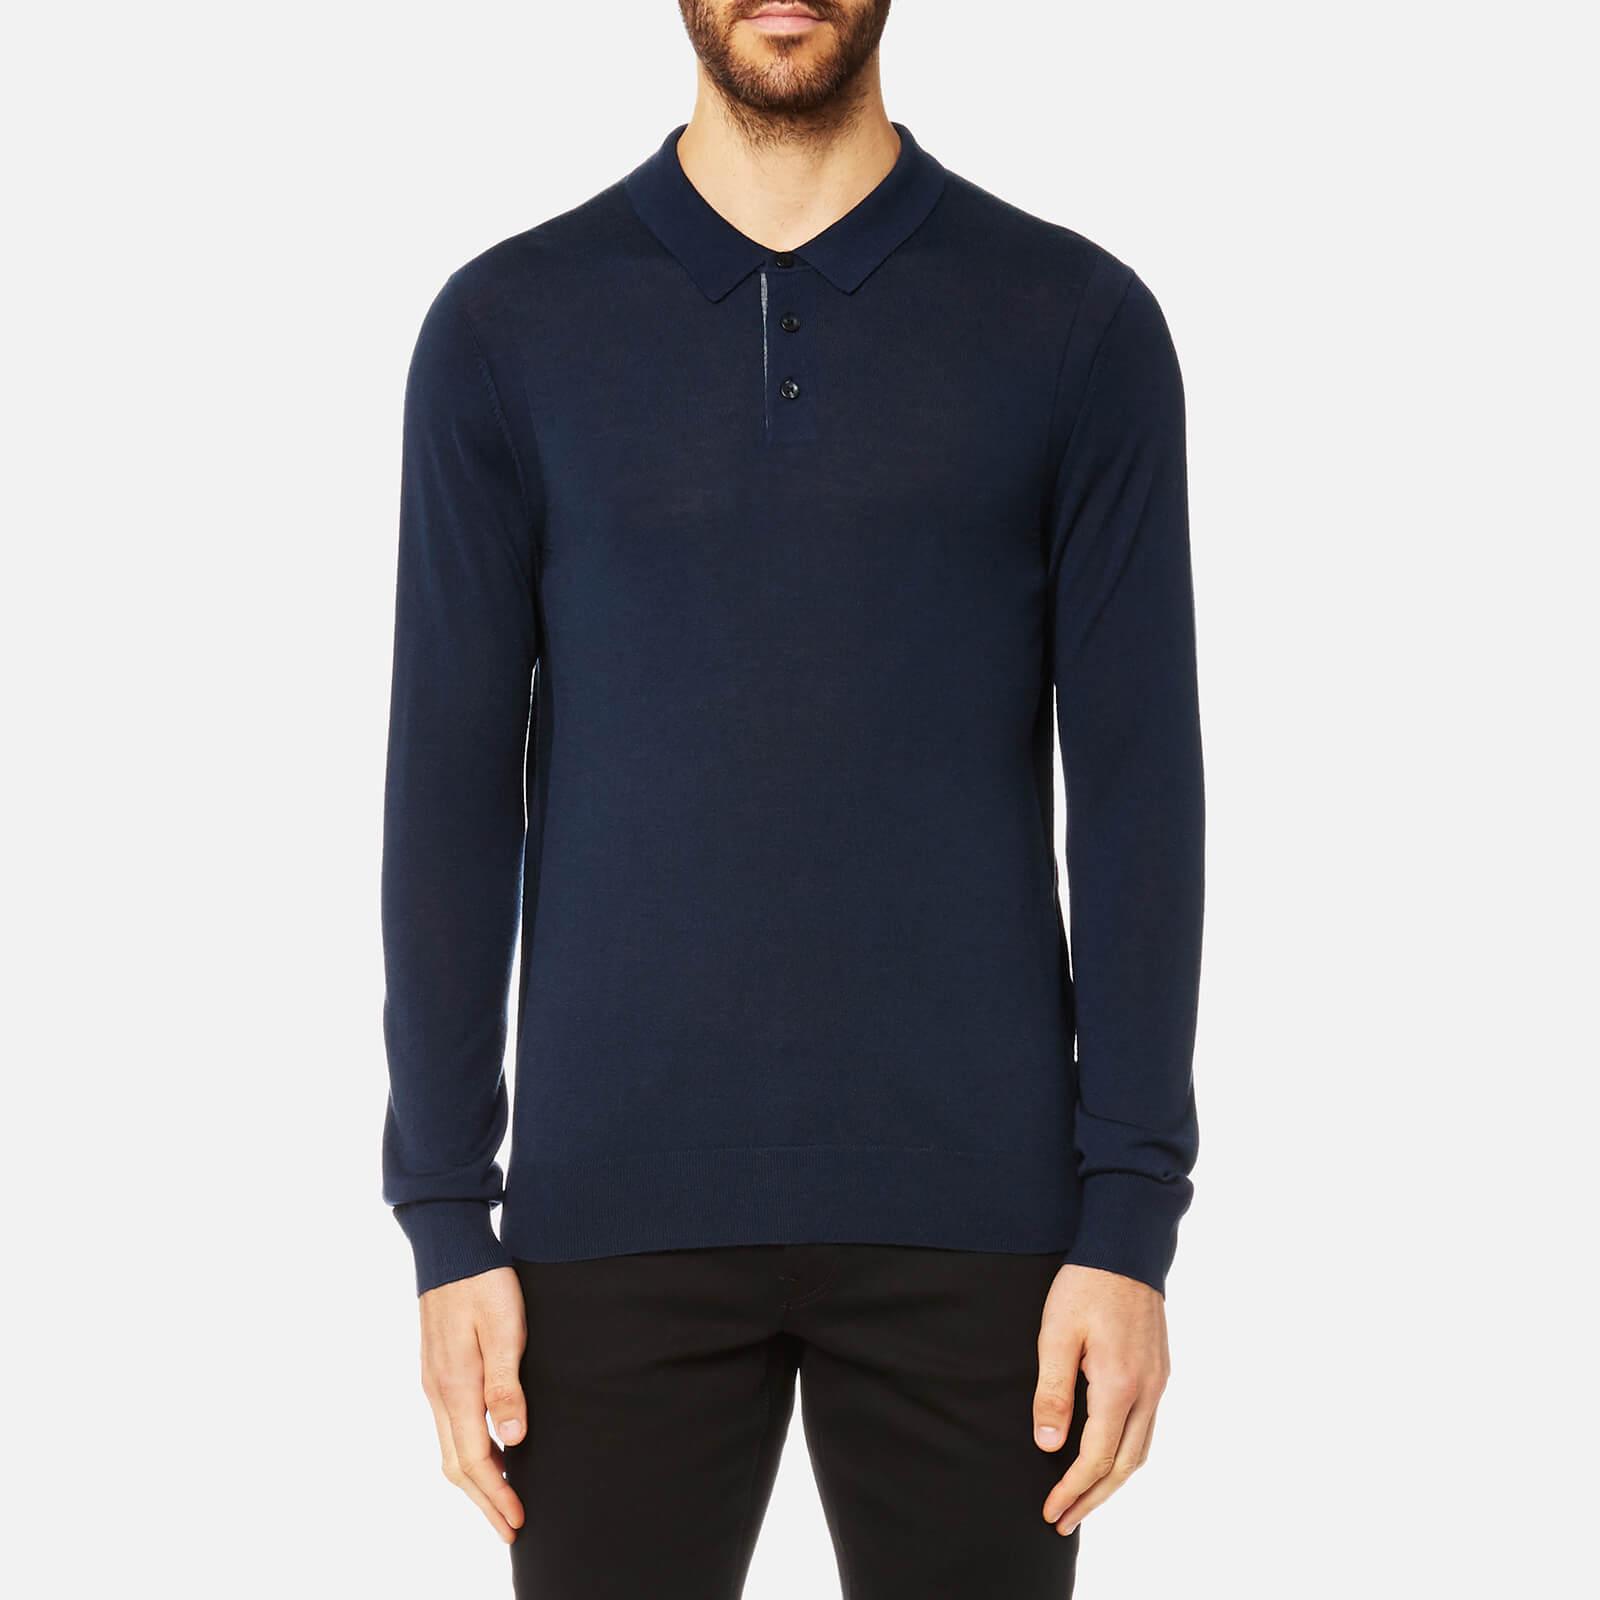 55f664e9 Michael Kors Men's Merino Long Sleeve Polo Shirt - Midnight - Free UK  Delivery over £50